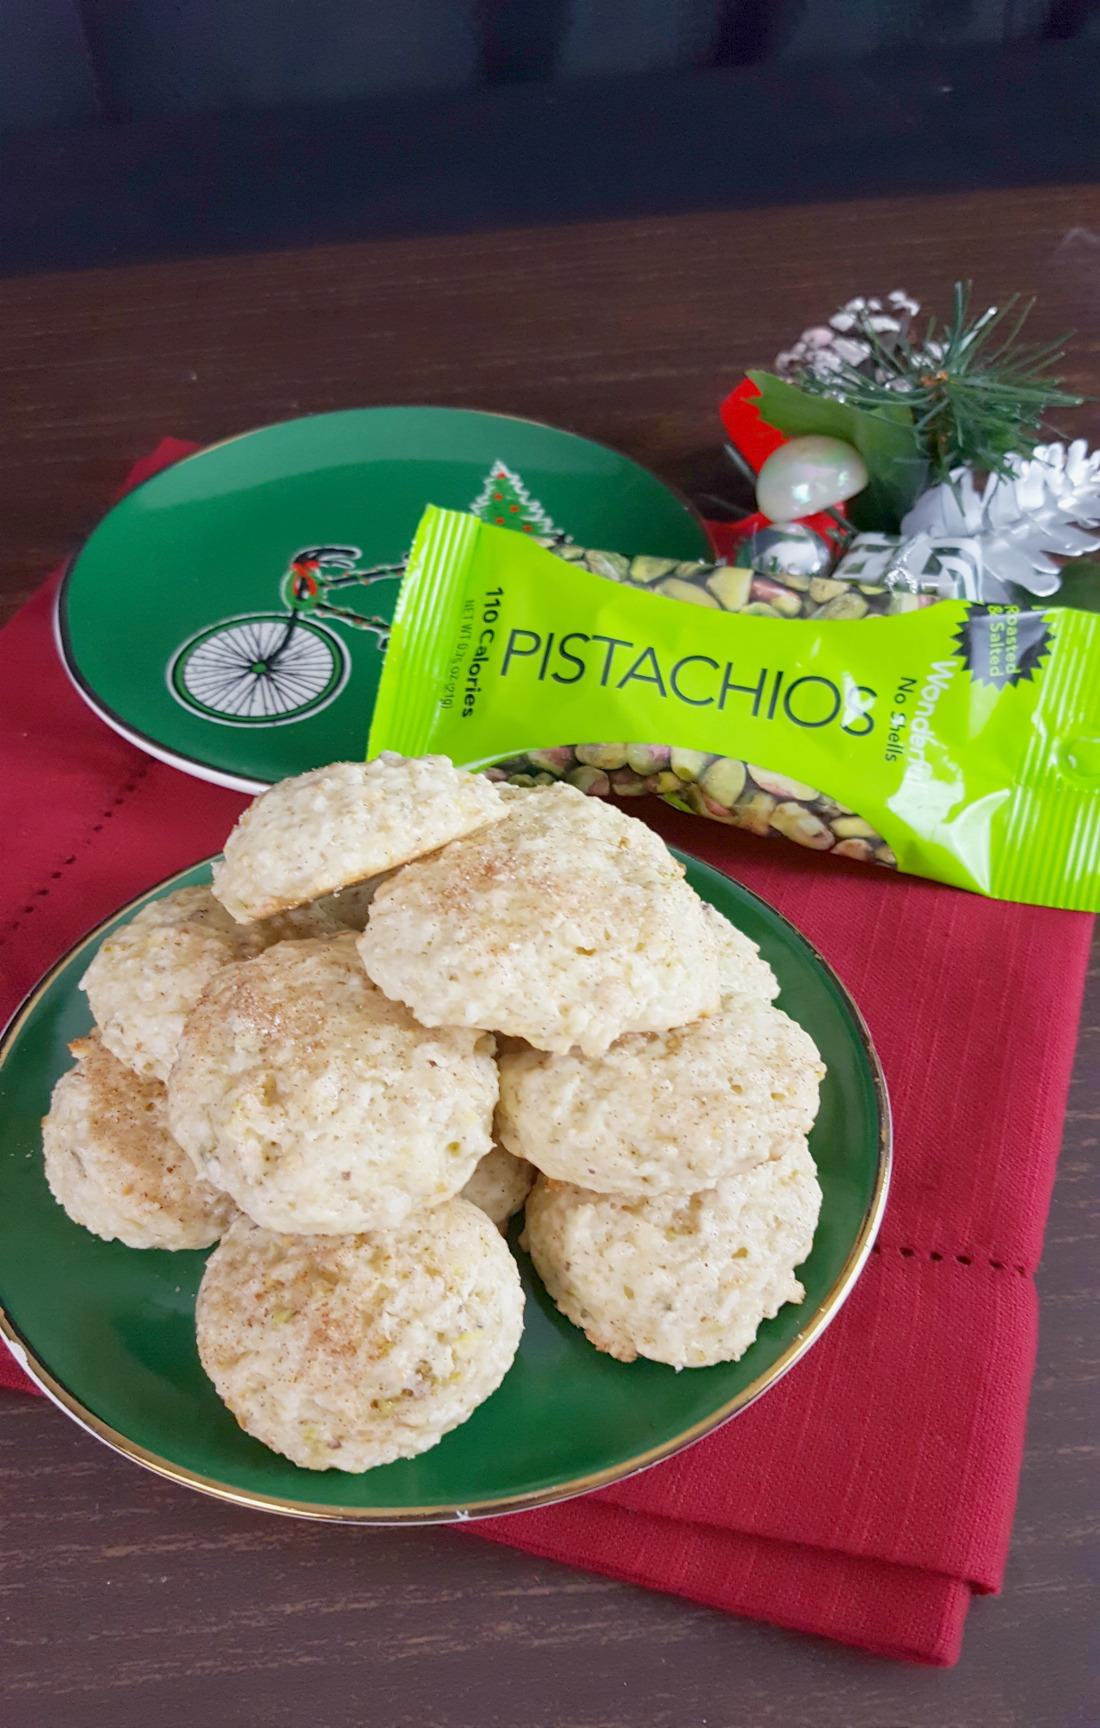 Pistachio and Coconut Cookies